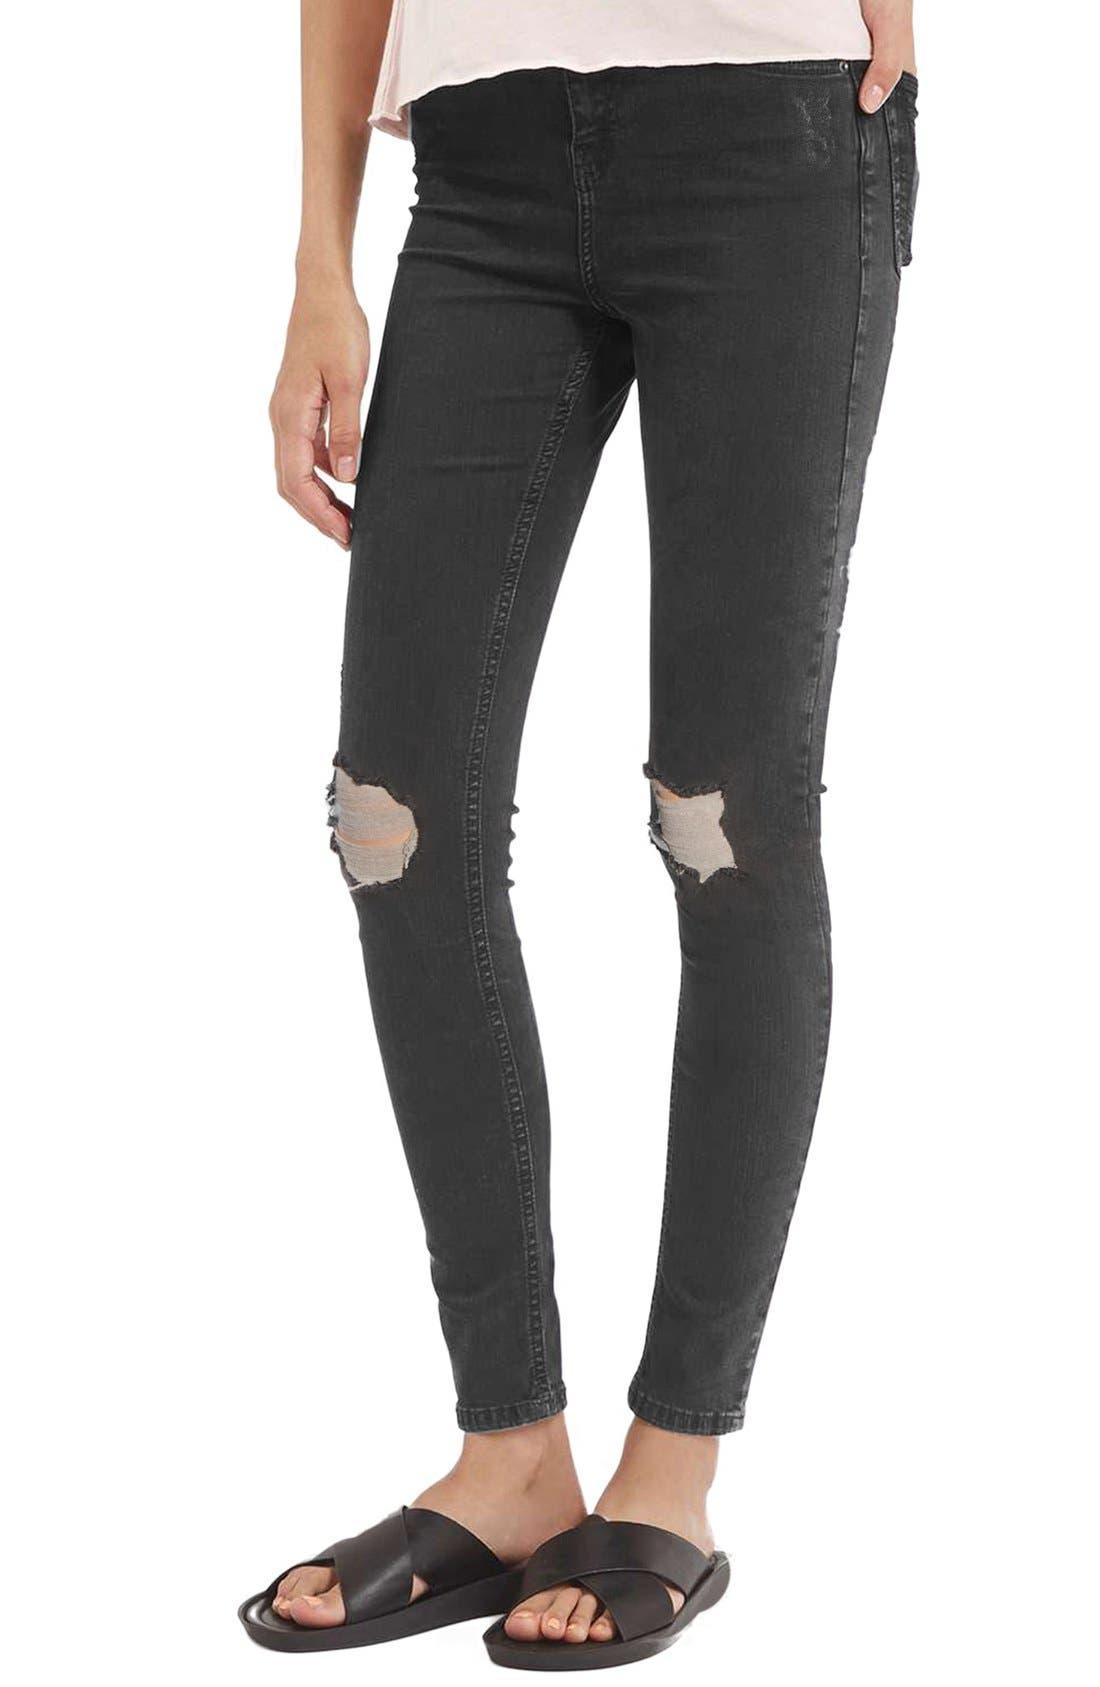 Jamie Shredded High Waist Skinny Jeans,                         Main,                         color, Black